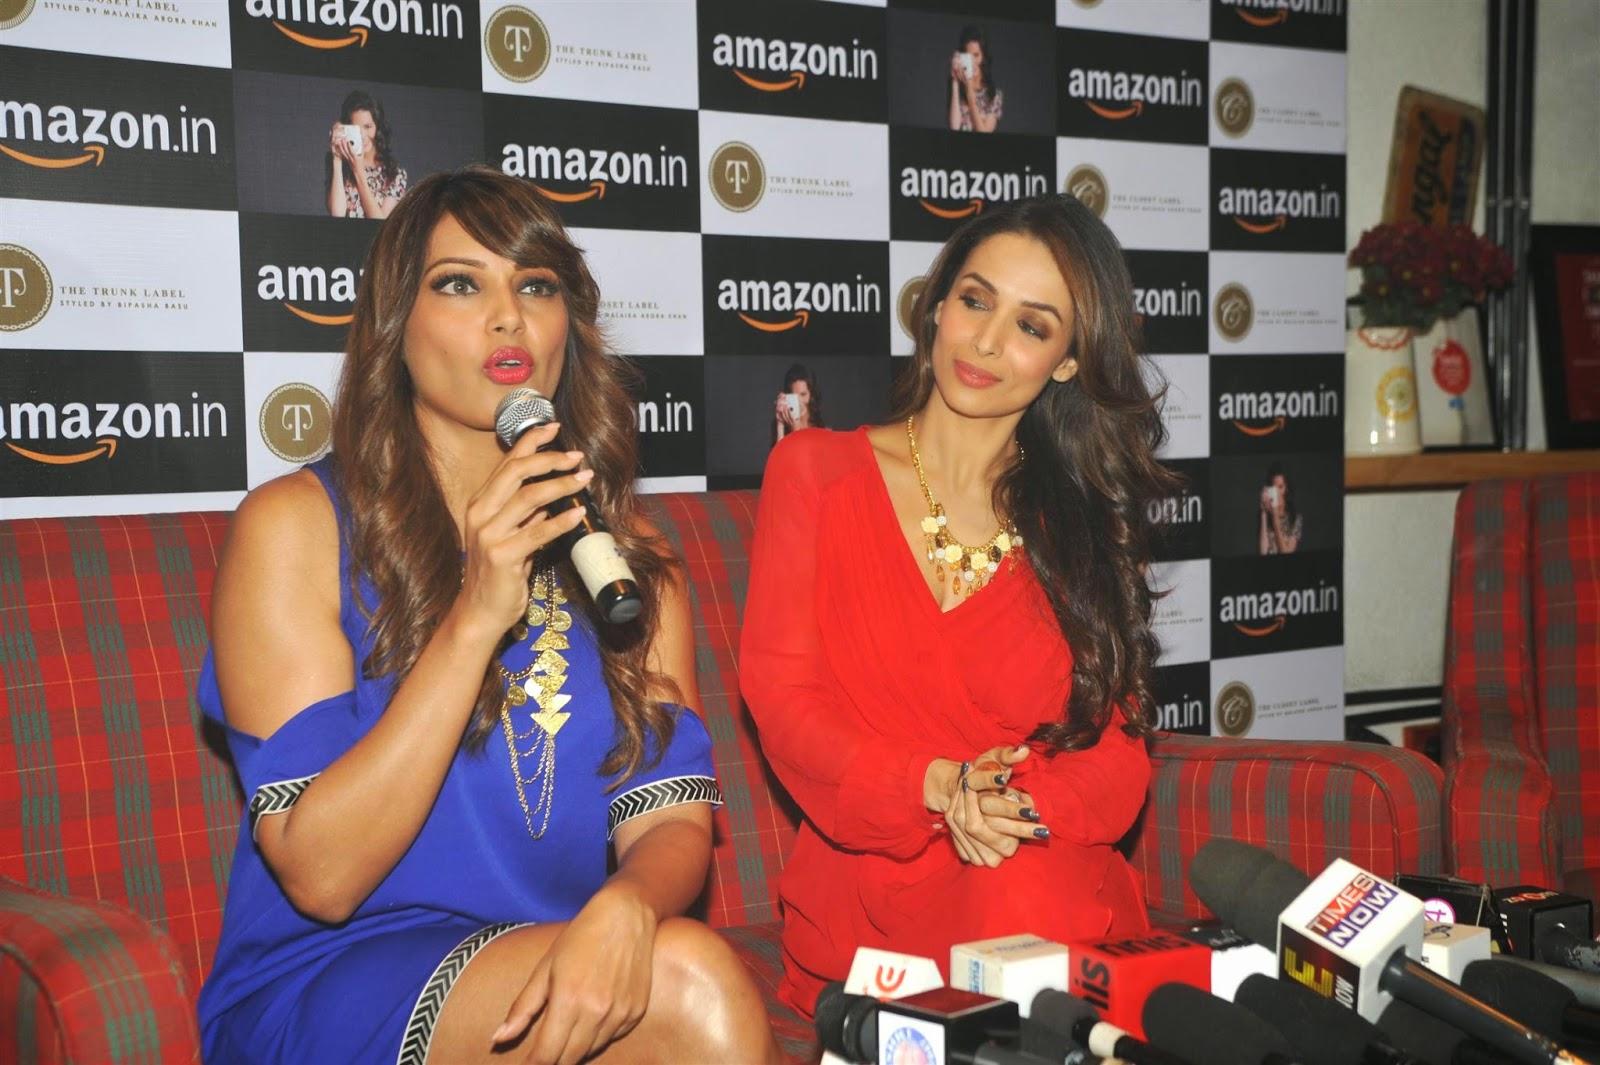 Bipasha Basu With Malaika Arora Khan at Amazon.in Event Photos